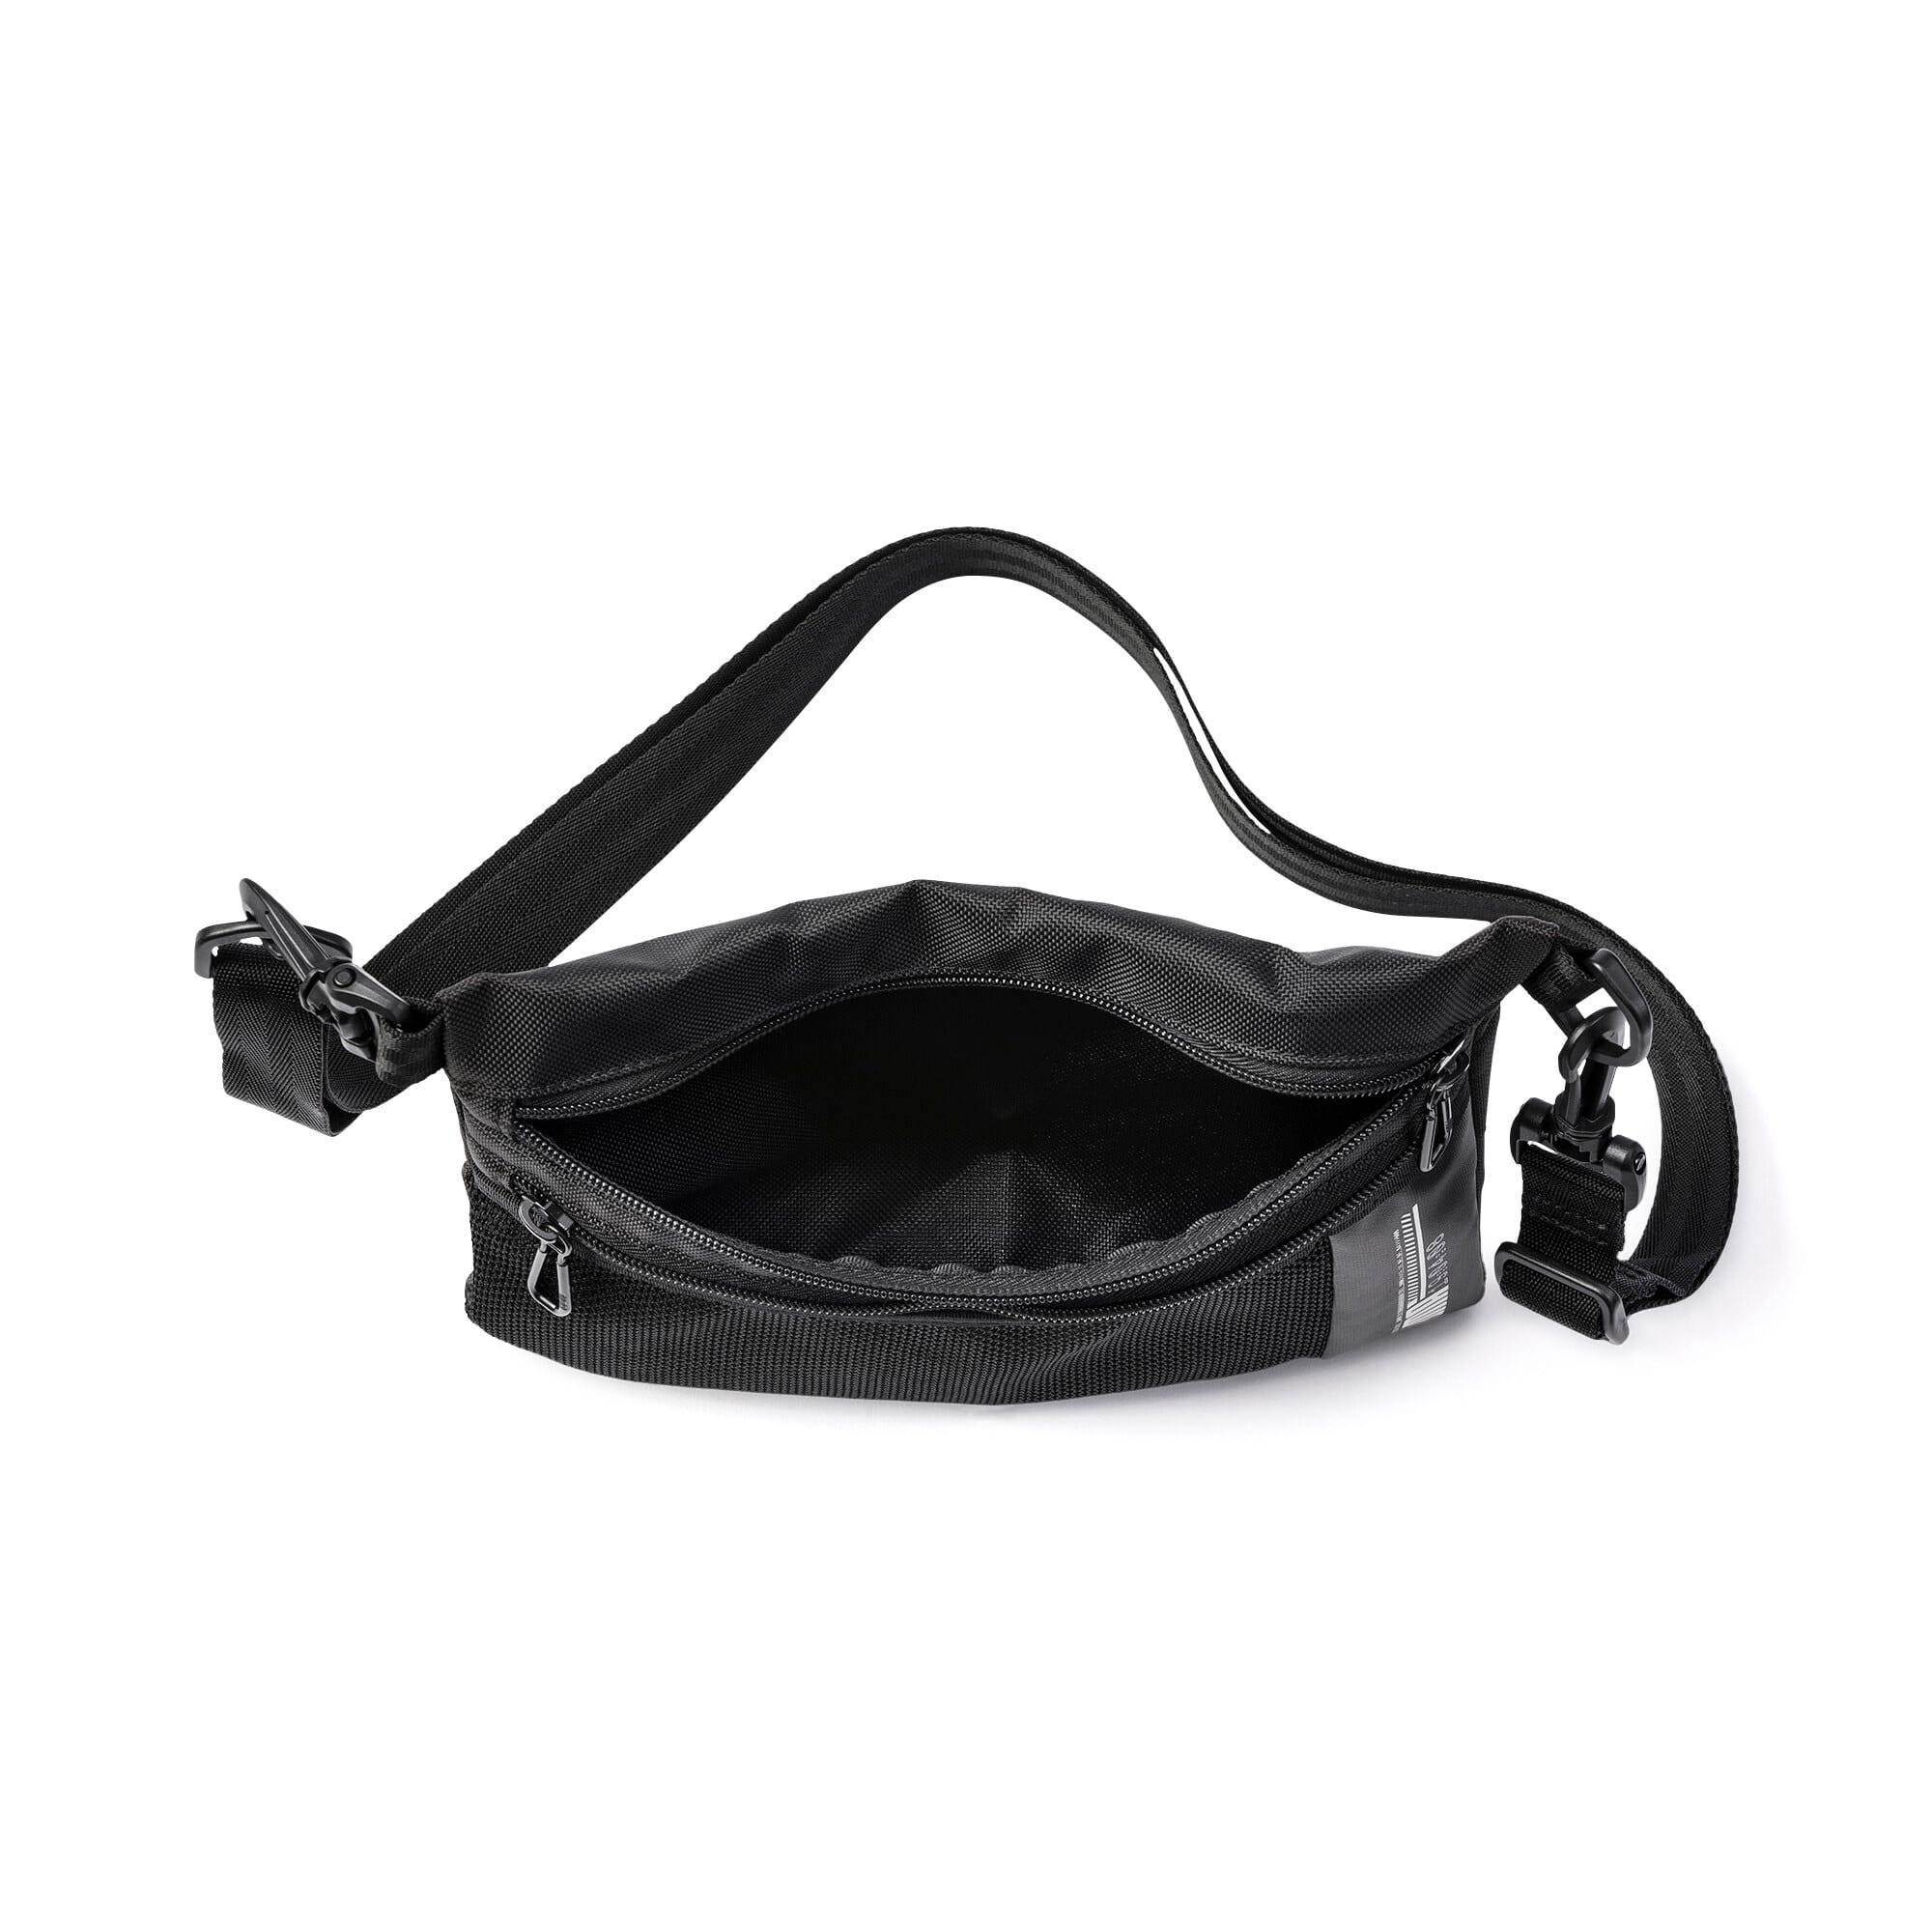 Thumbnail 4 of Energy Sacoche Bag, Puma Black, medium